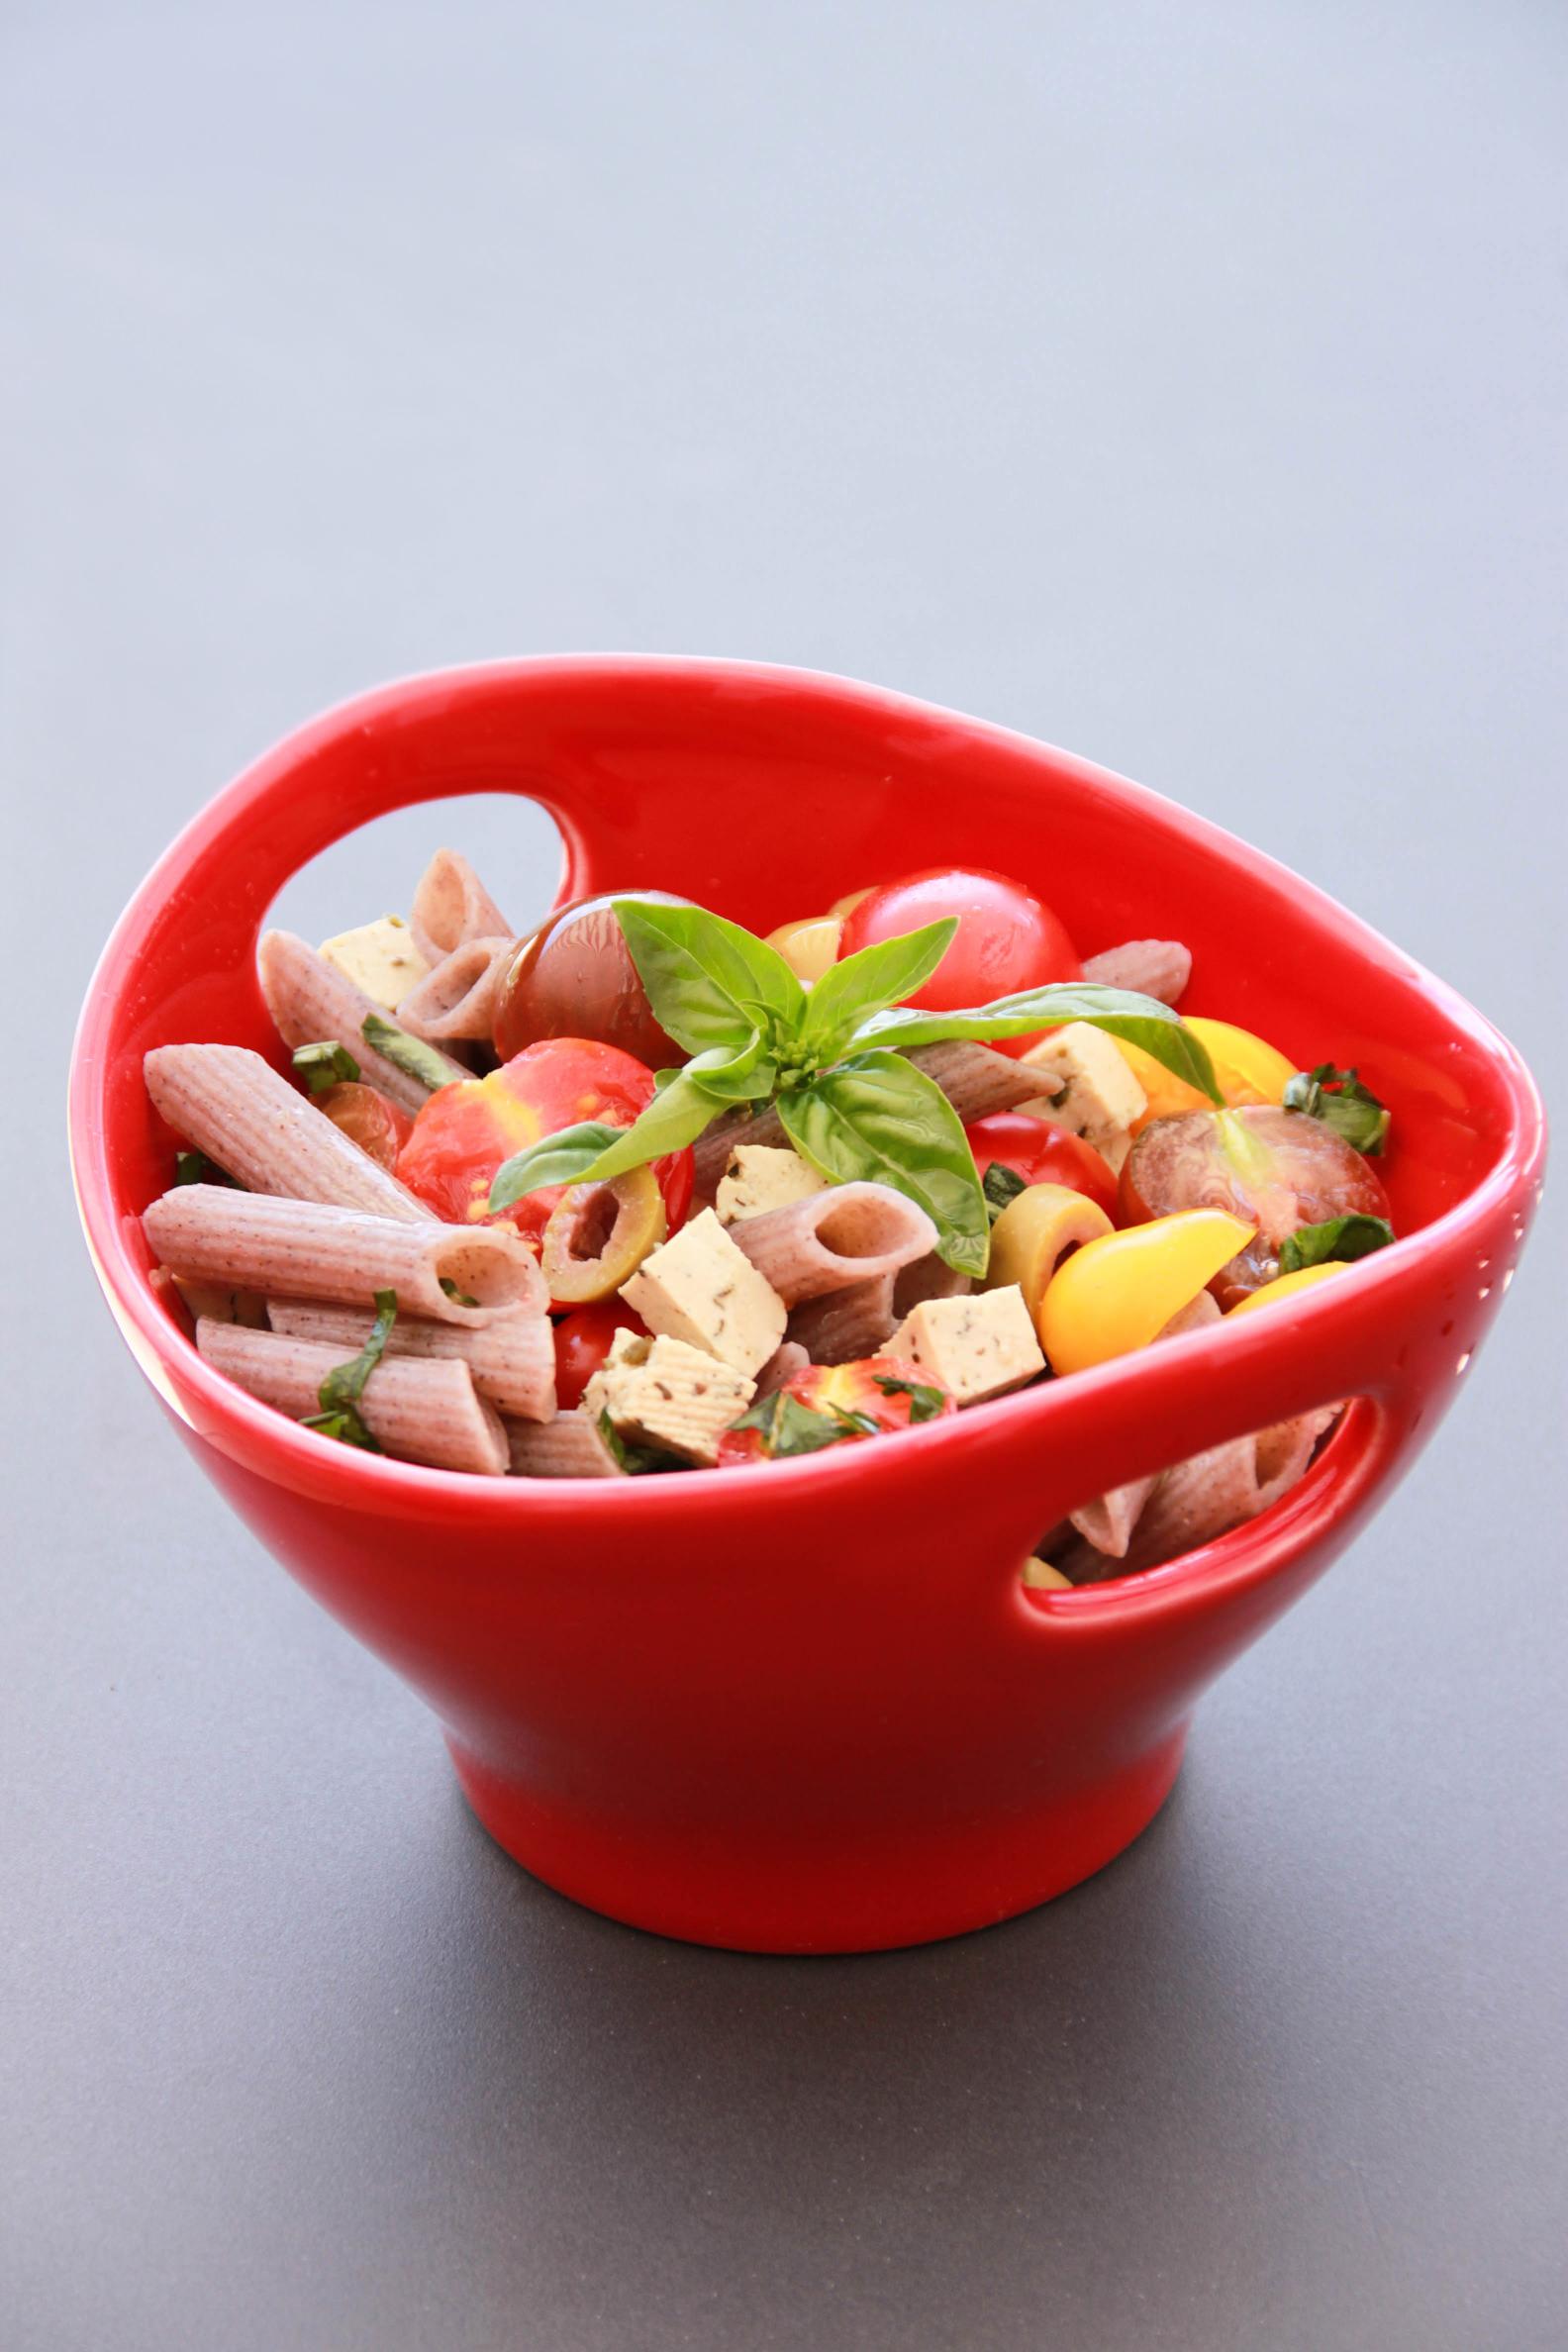 Salade de pâtes au sarrasin, basilic, tomates cerise, tomates poires et tofu aux herbes